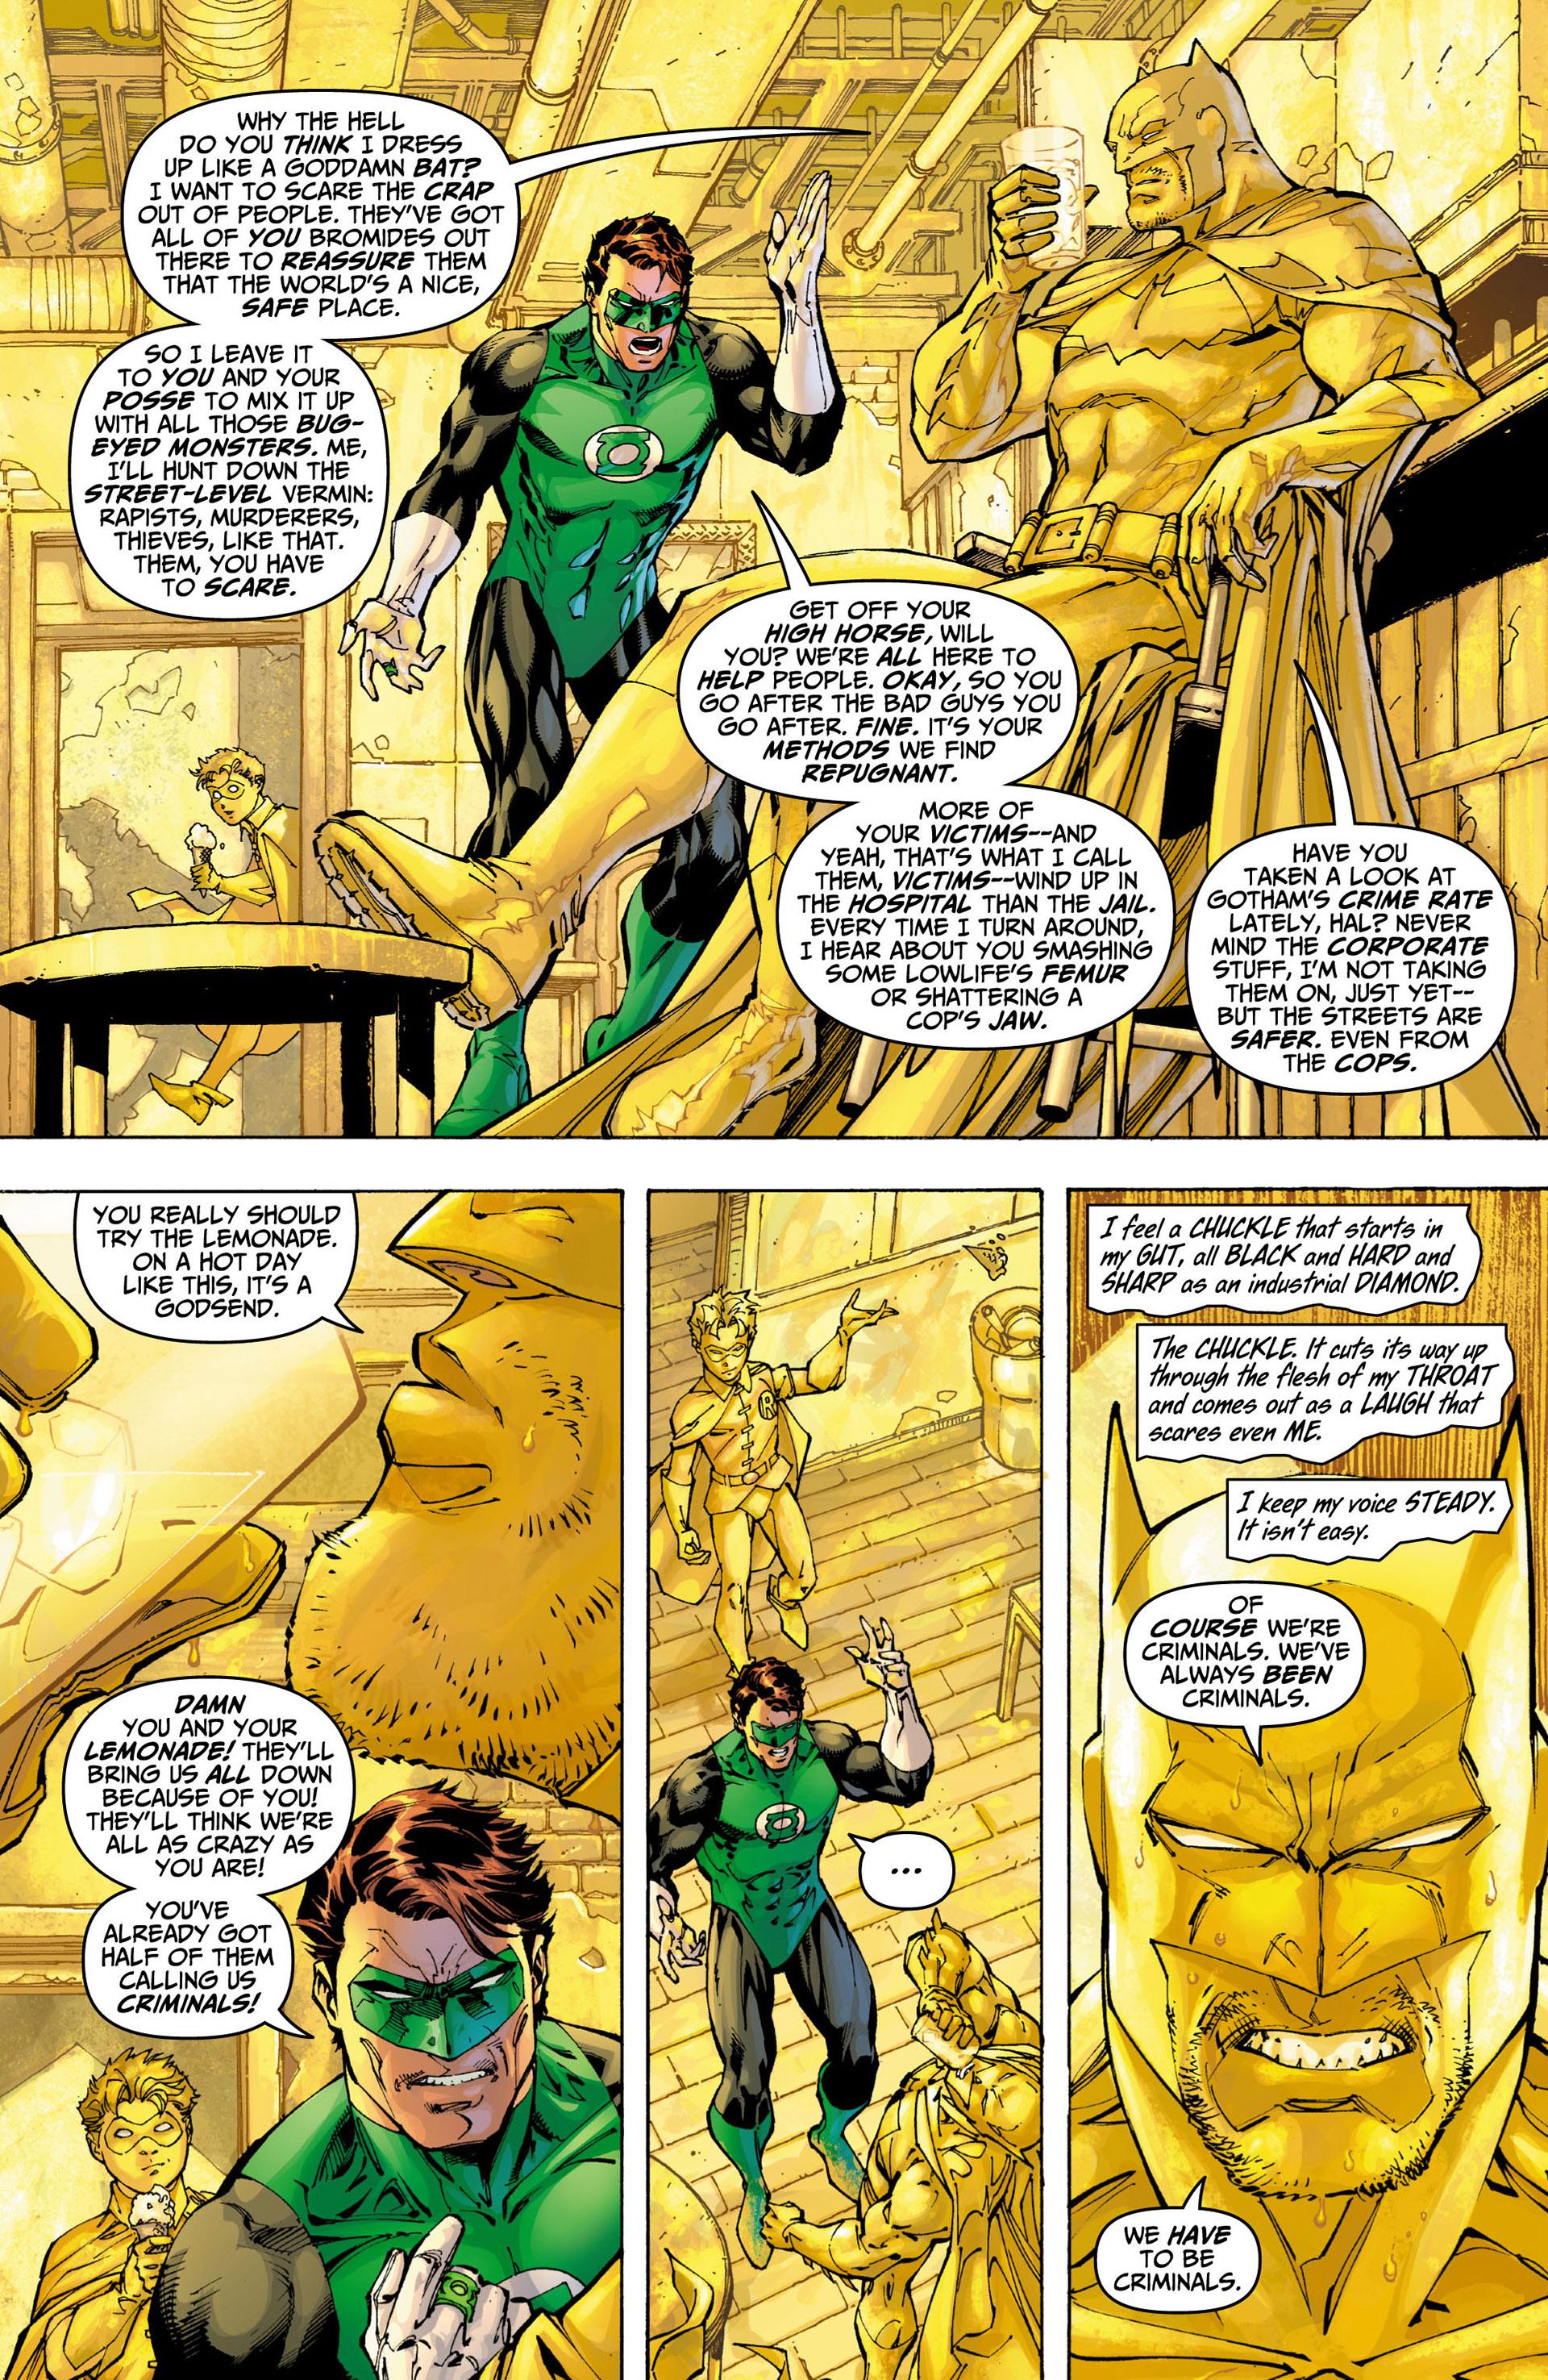 Read online All Star Batman & Robin, The Boy Wonder comic -  Issue #9 - 5